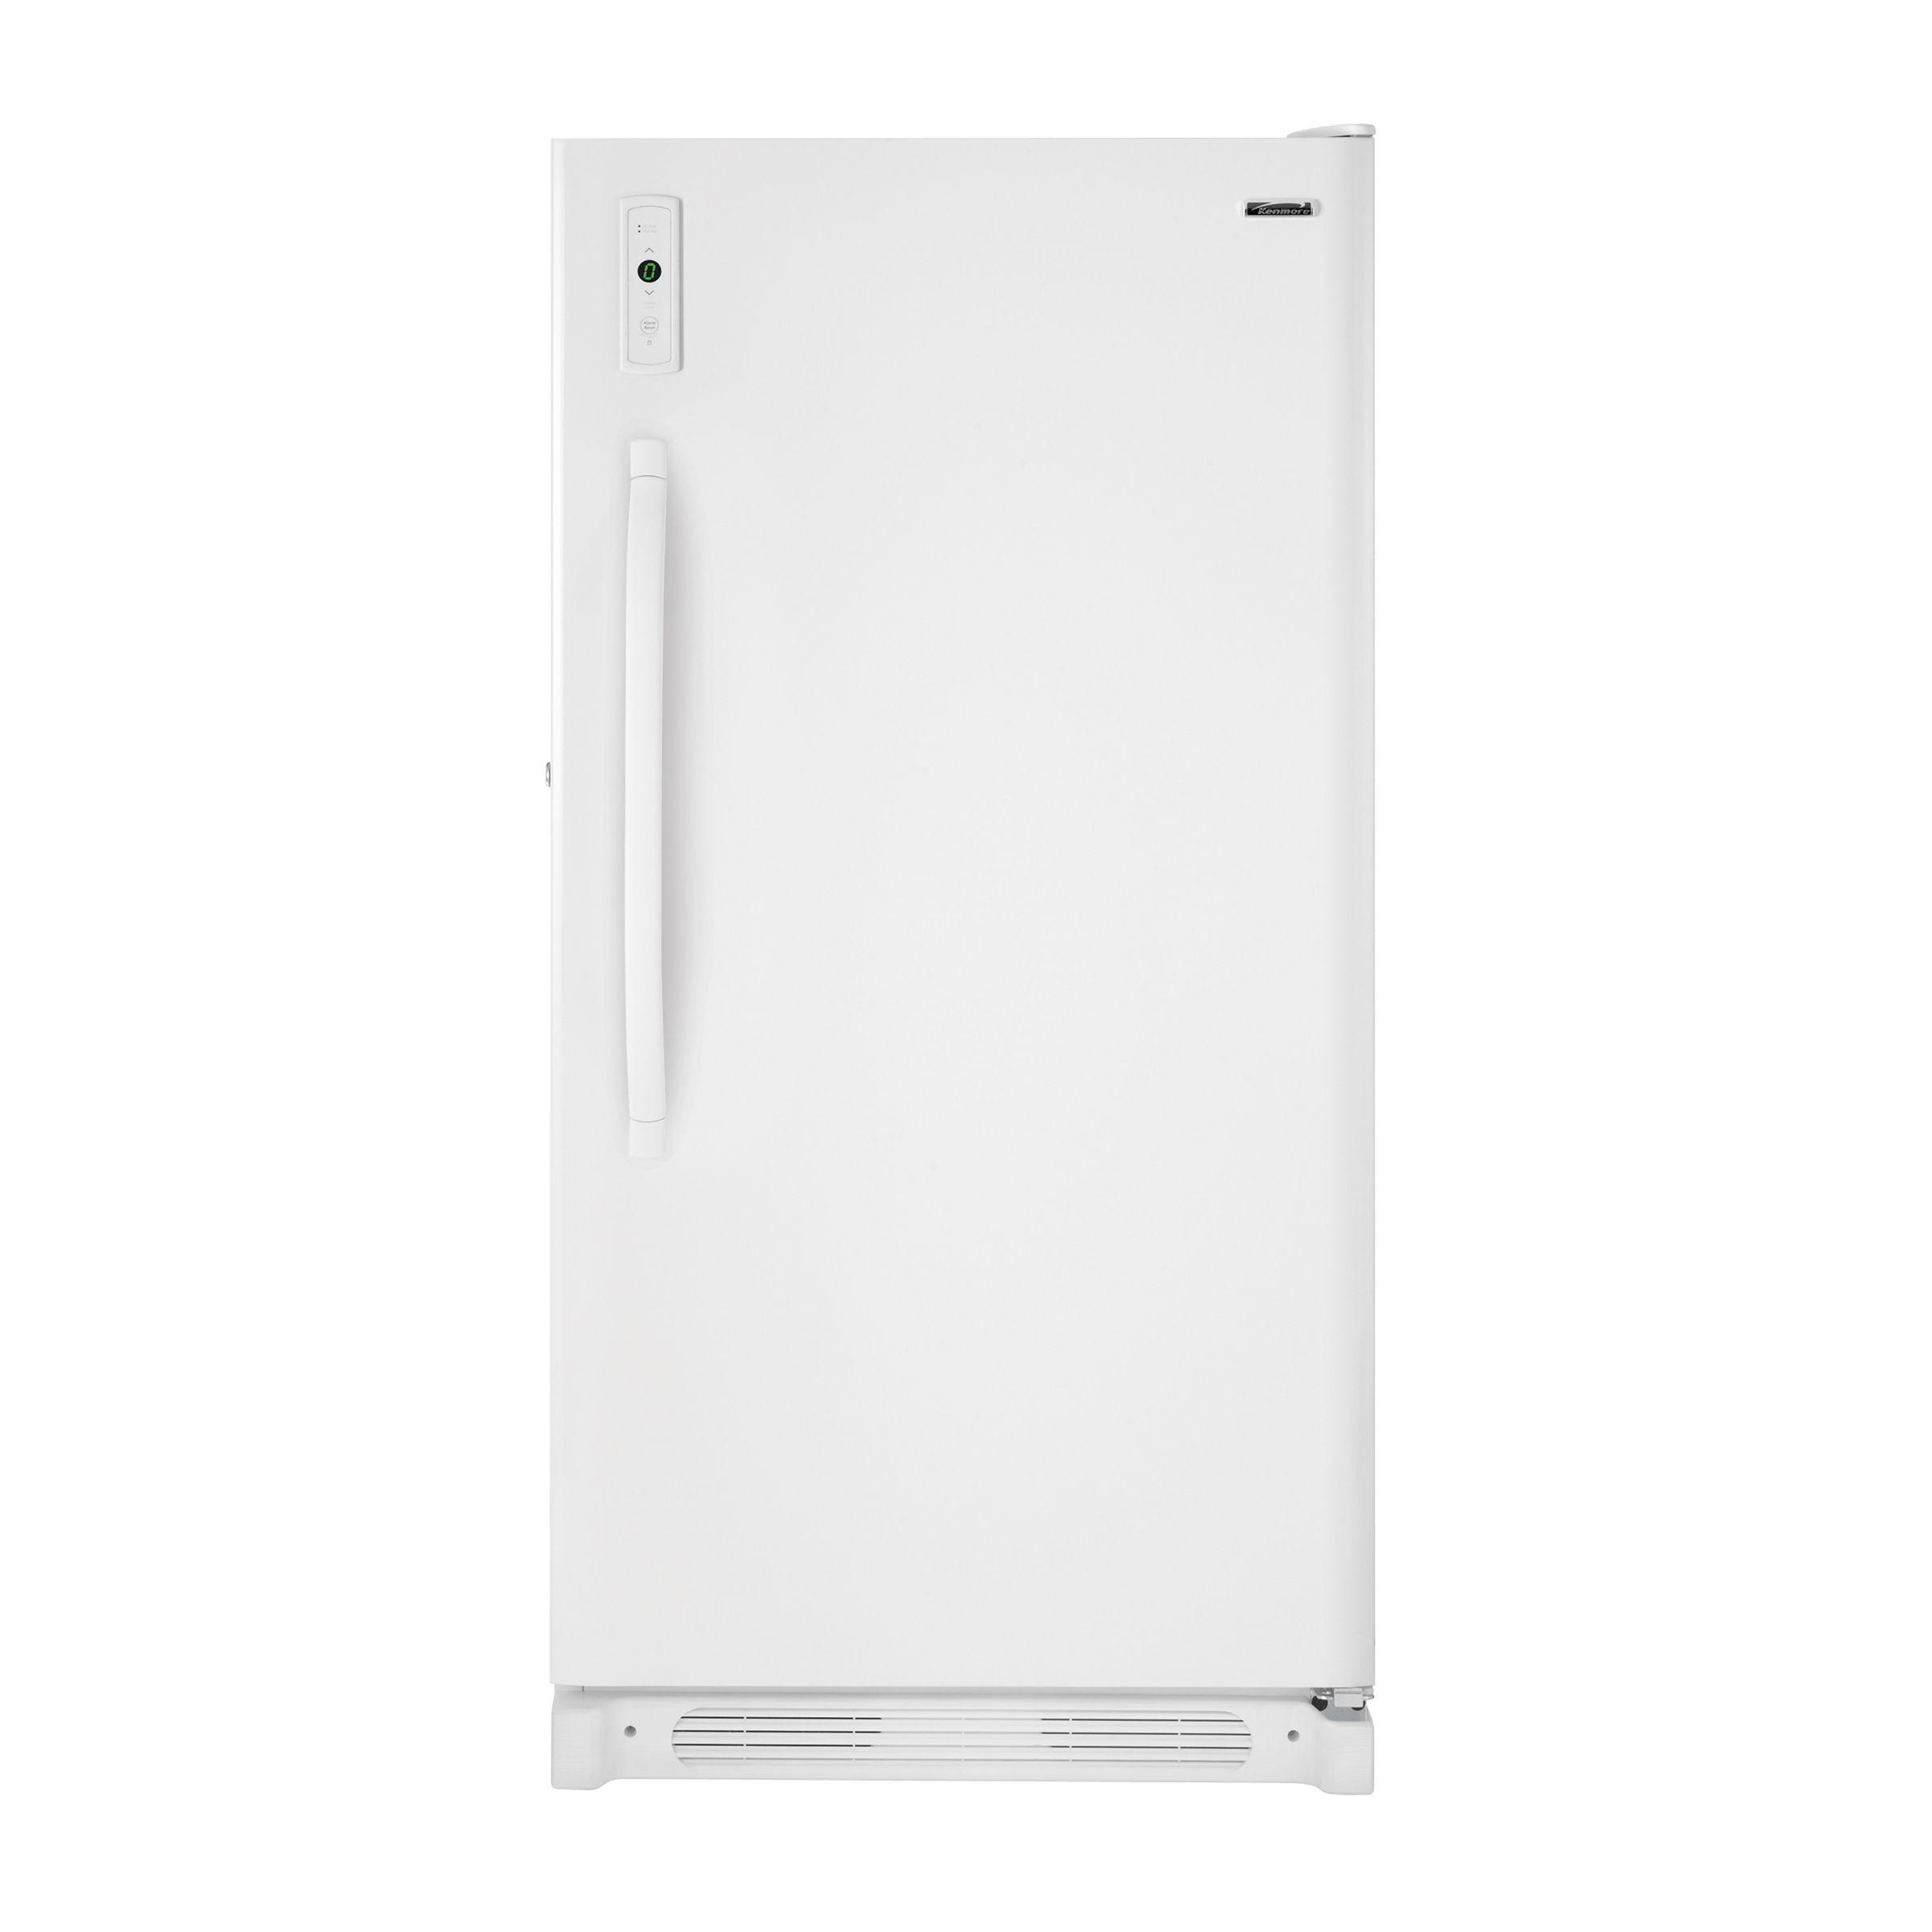 hight resolution of kenmore freezer model 253 wiring diagram wiring diagram m9 sears freezer wiring diagram